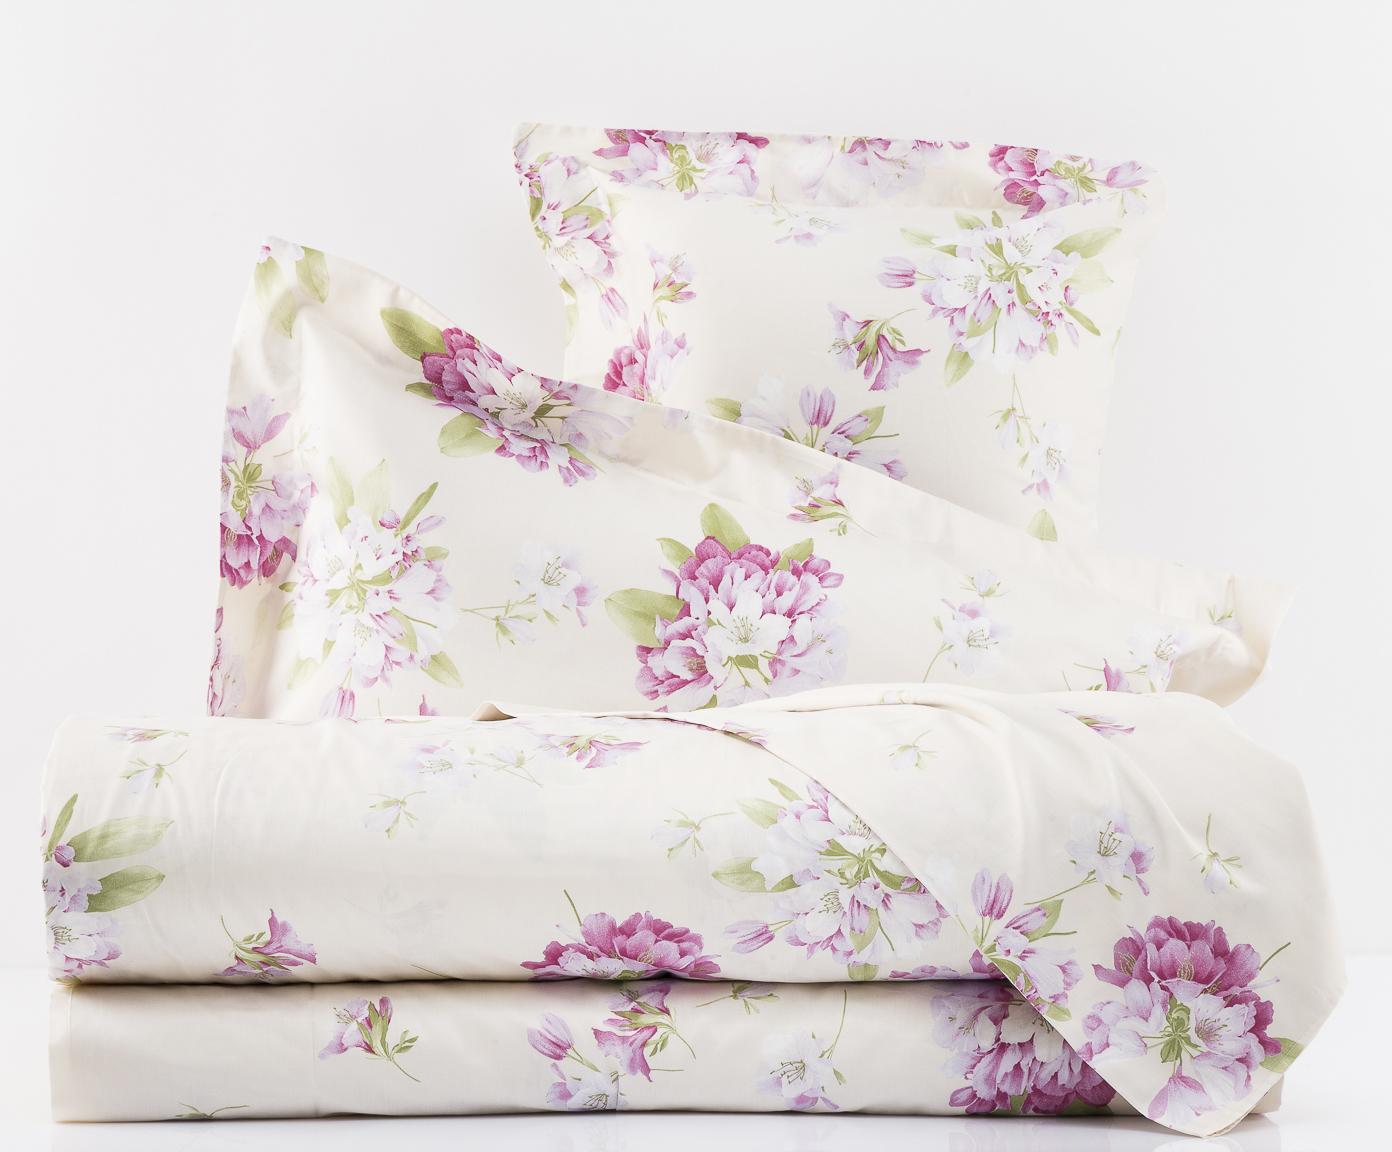 Постельное Постельное белье семейное Mirabello Rododendri с розовыми цветами postelnoe-belie-mirabello-rododendri-s-rozovymi-tsvetami-italiya.jpg